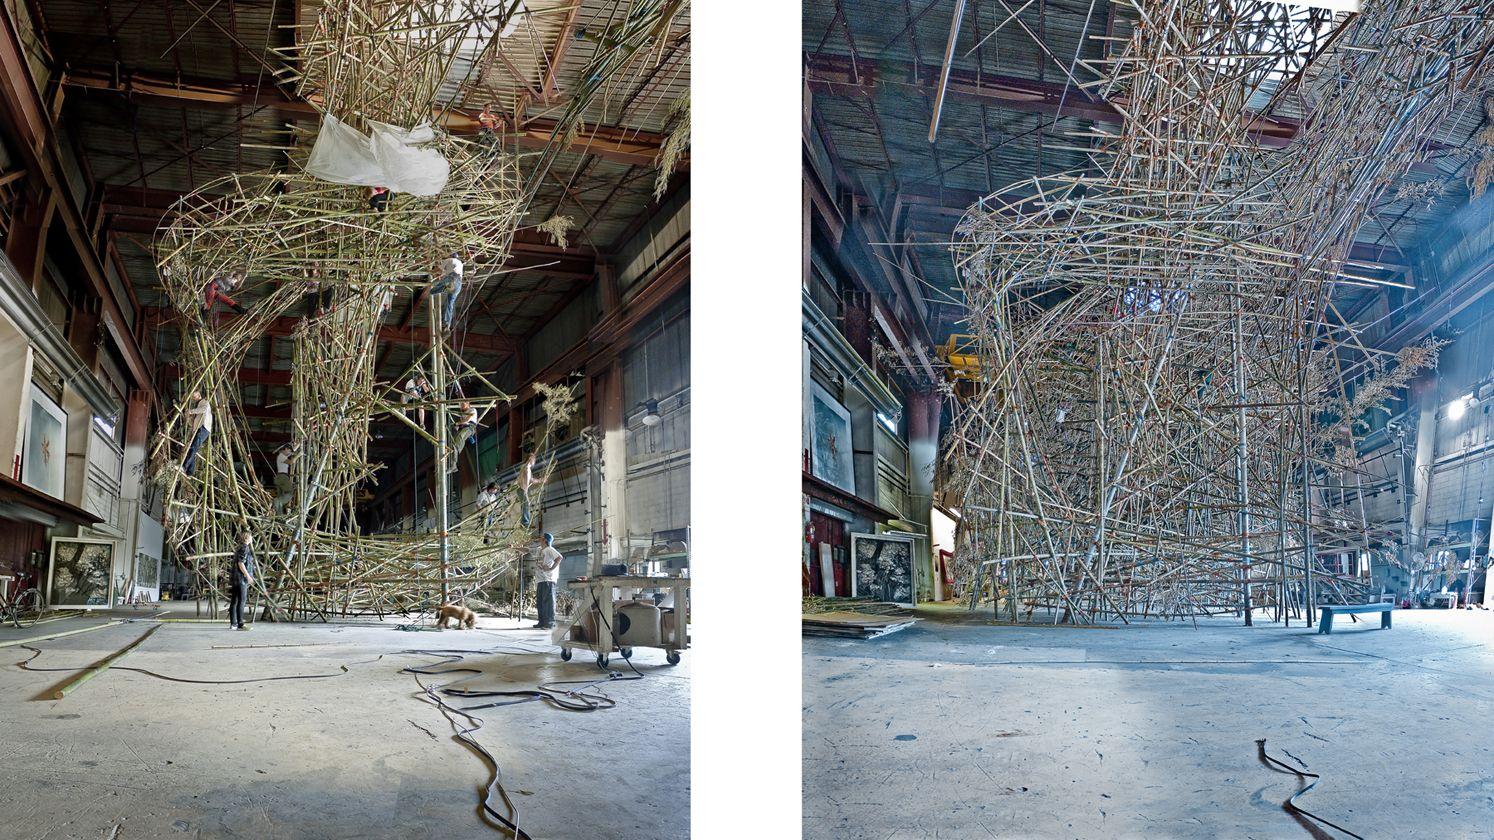 doug starn & mike starn - big bambu series, ny times t, and t plus 6 weeks, 2009